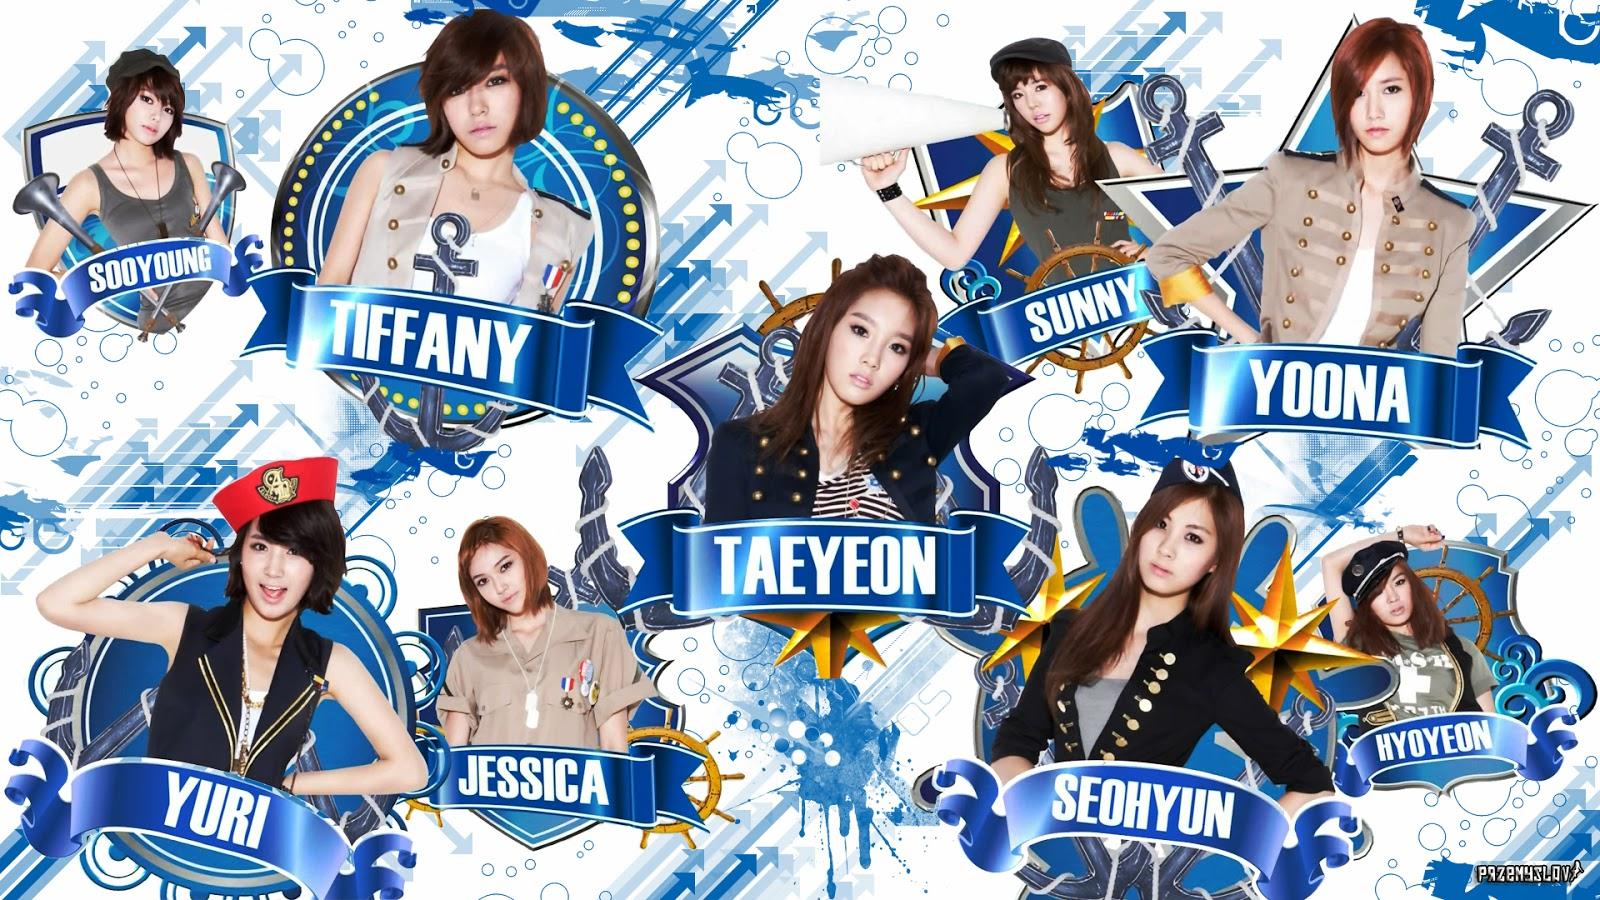 Biodata SNSD | Profil Personil SNSD Lengkap Member Girls Generation